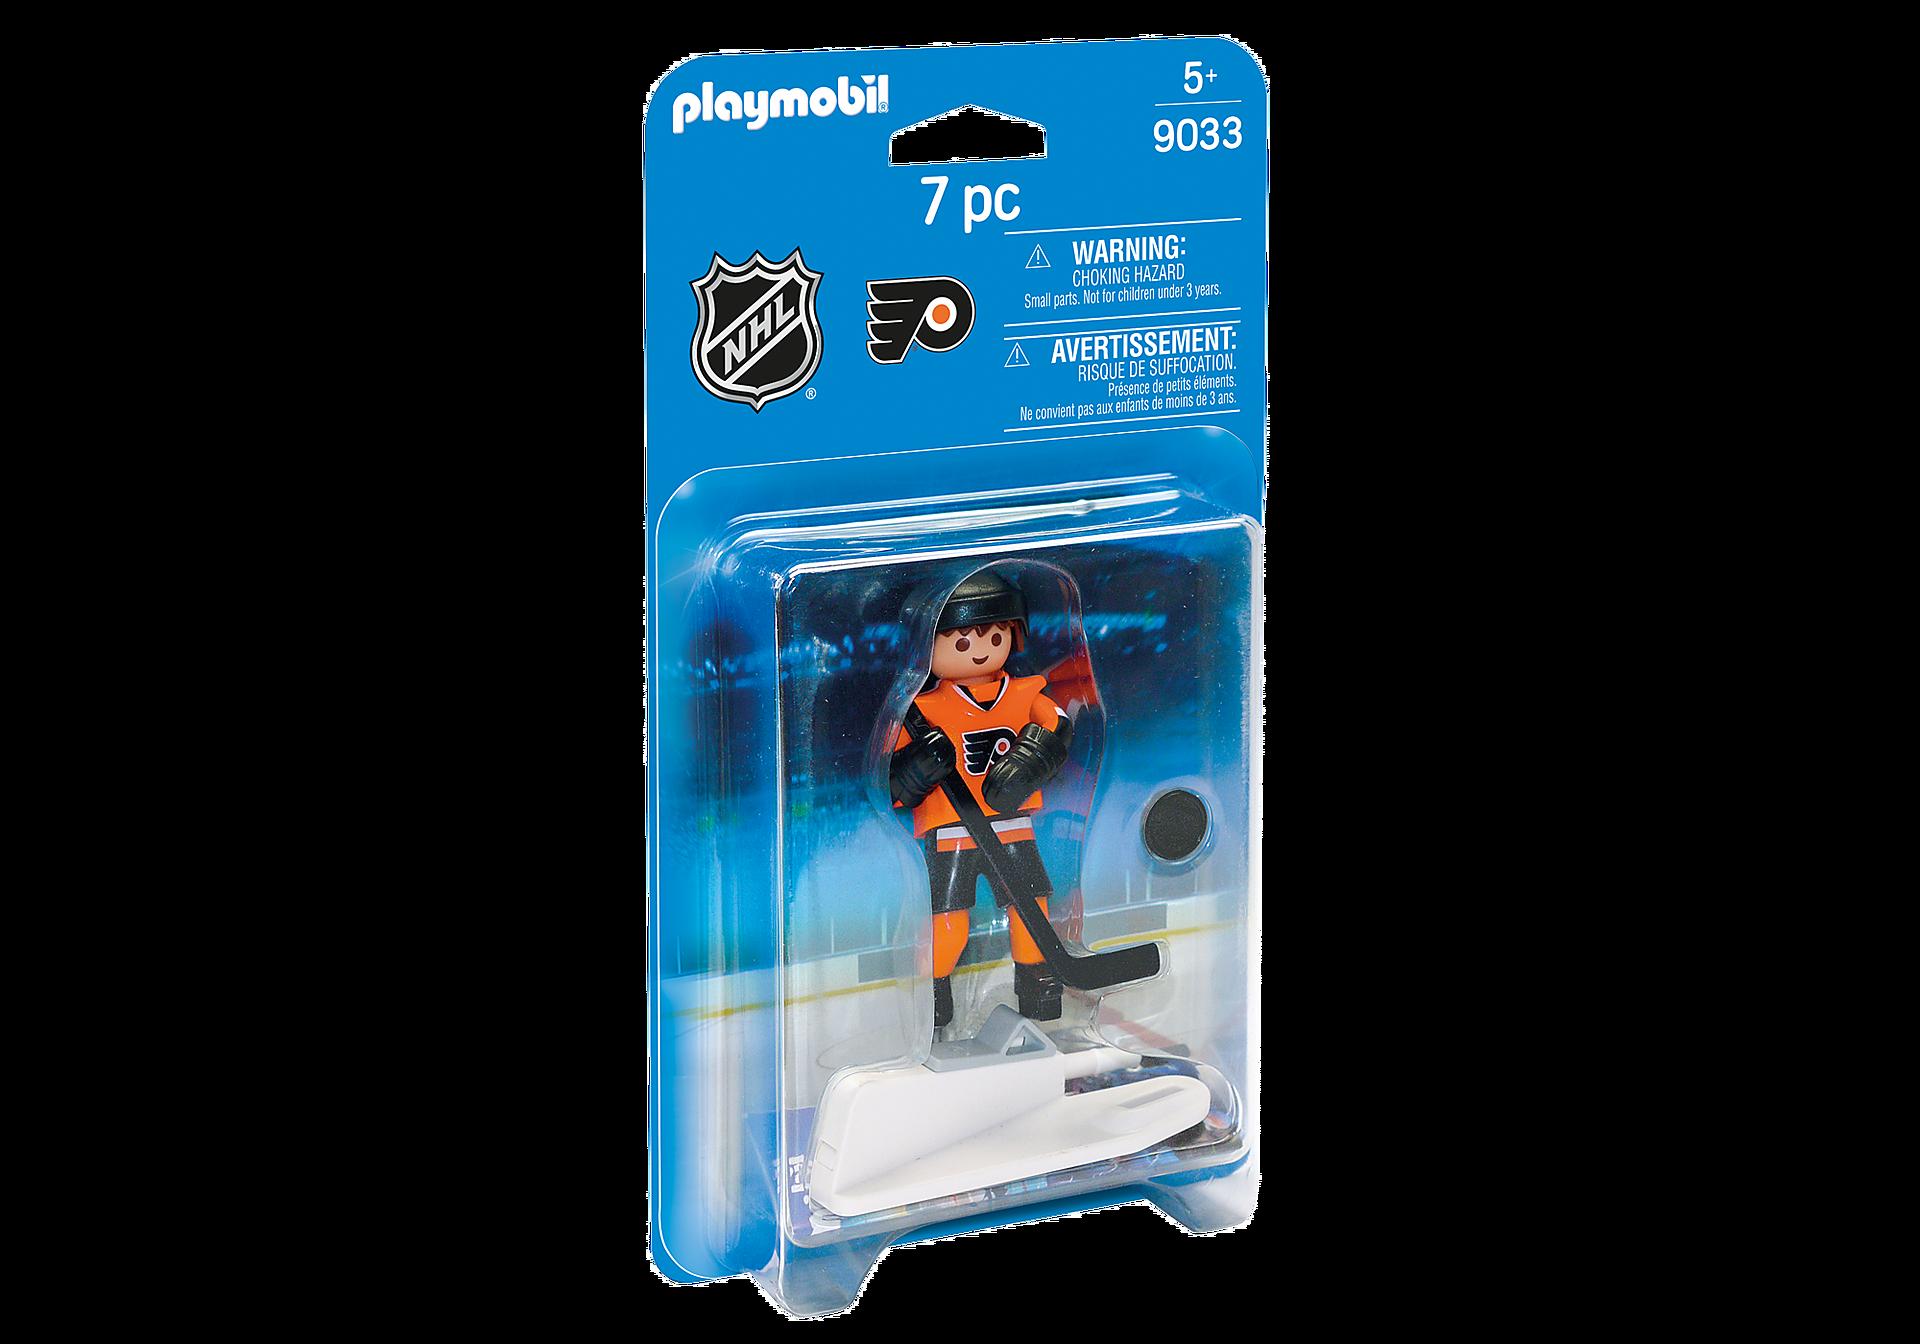 9033 NHL™ Philadelphia Flyers™ Player zoom image2